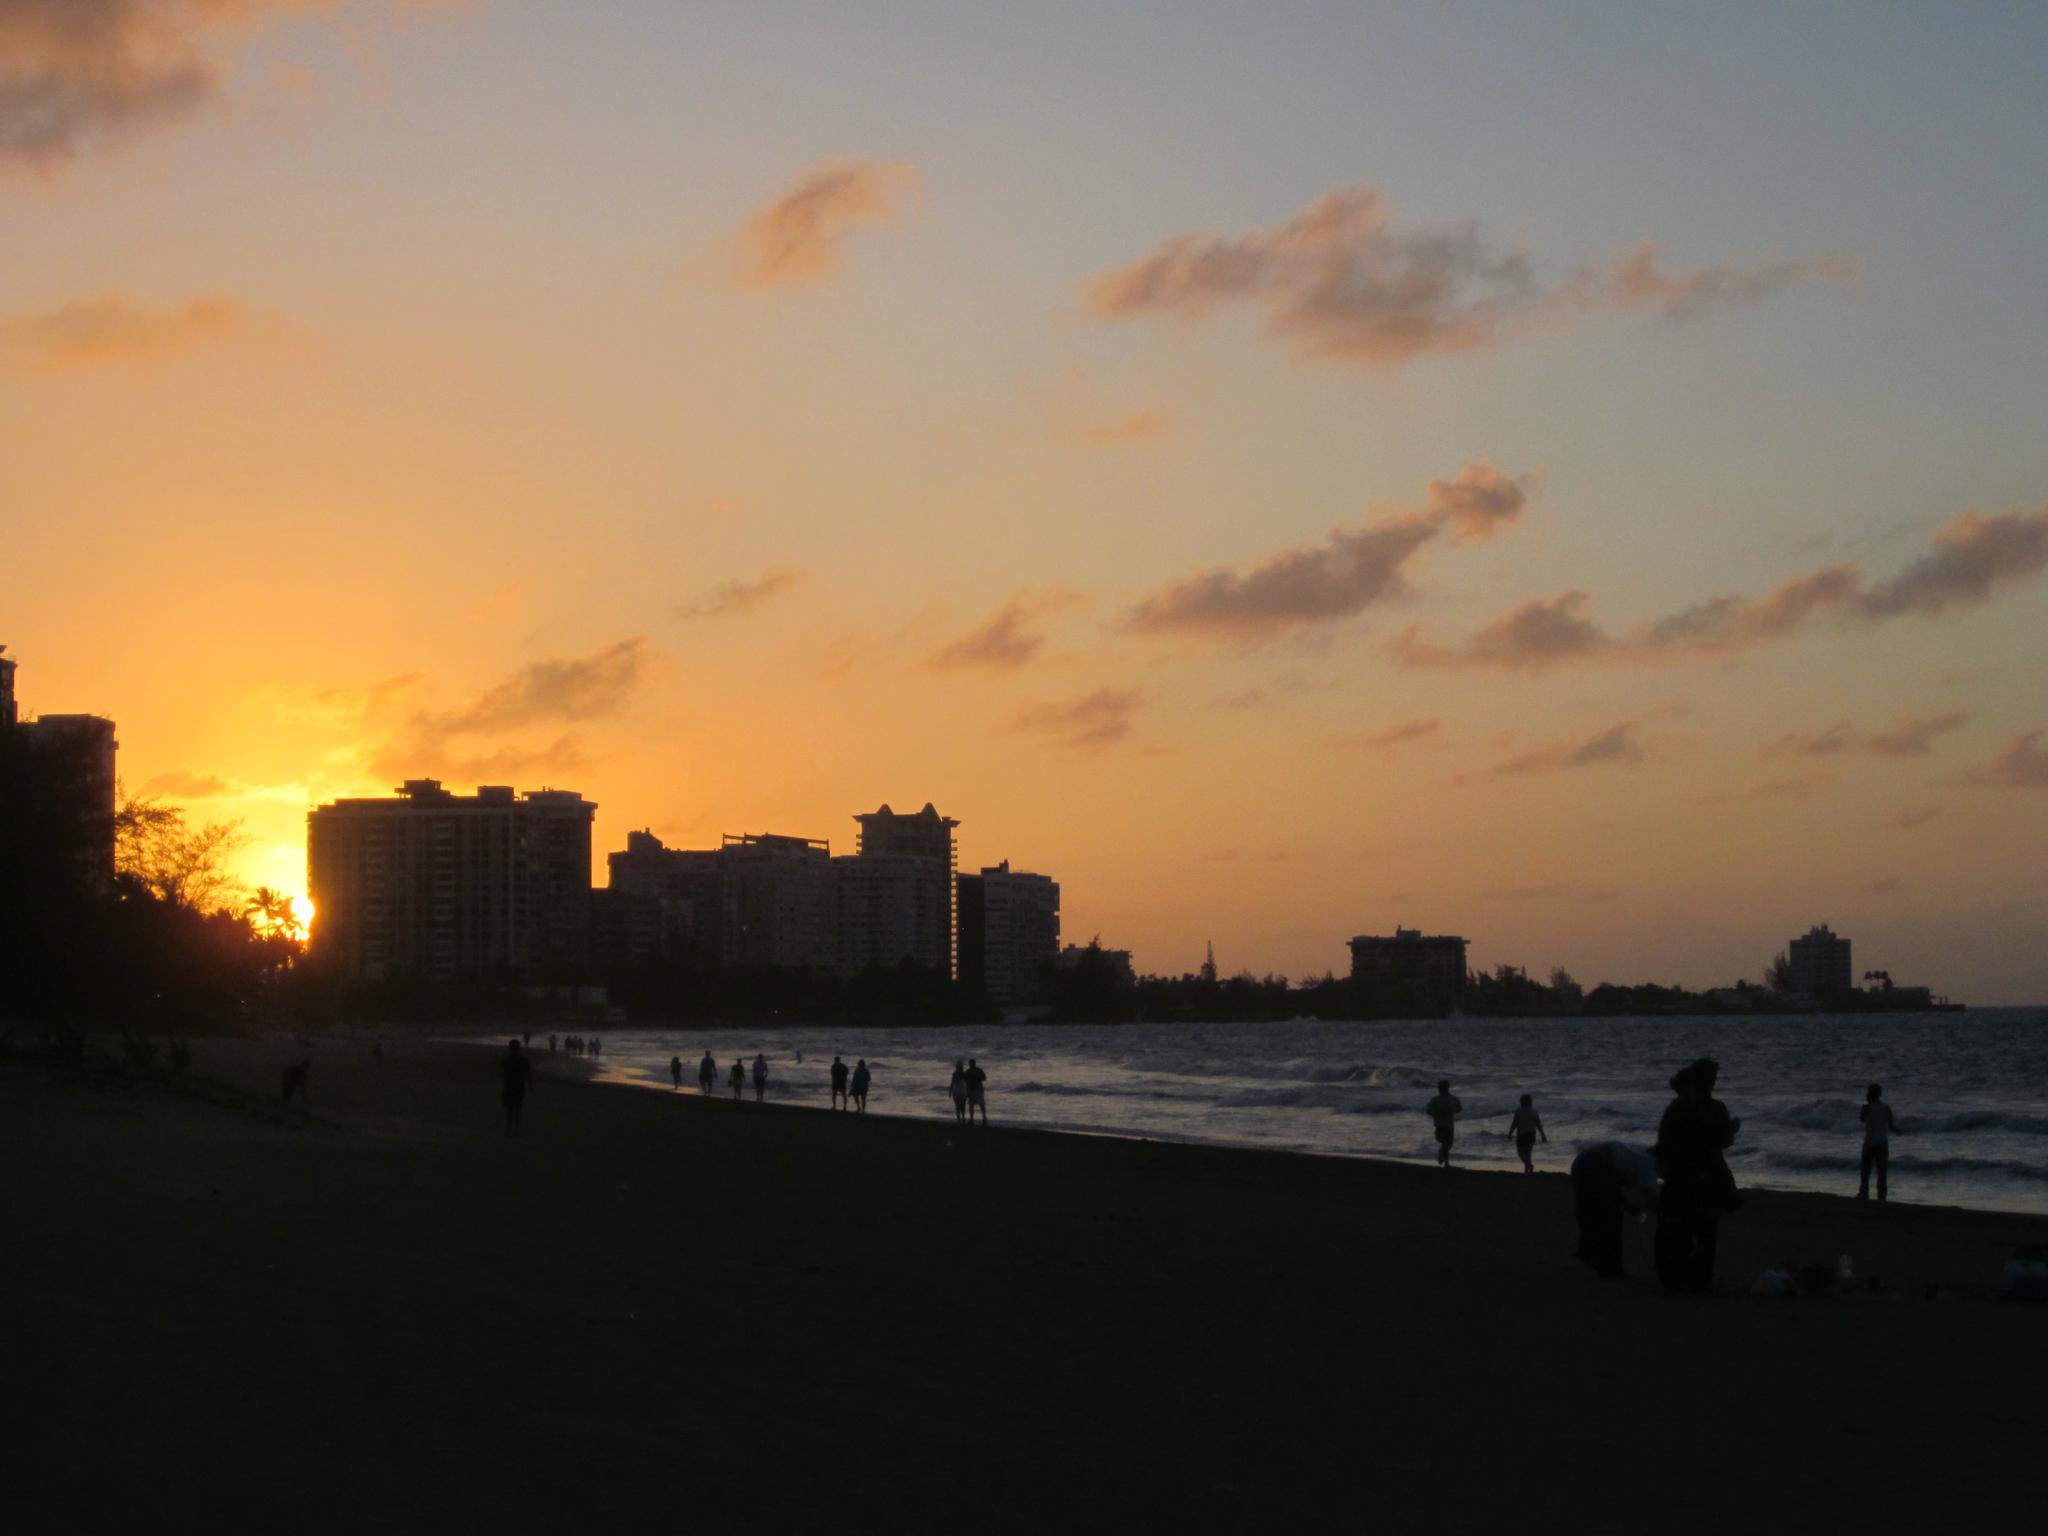 Puerto Rico by RHarrison3